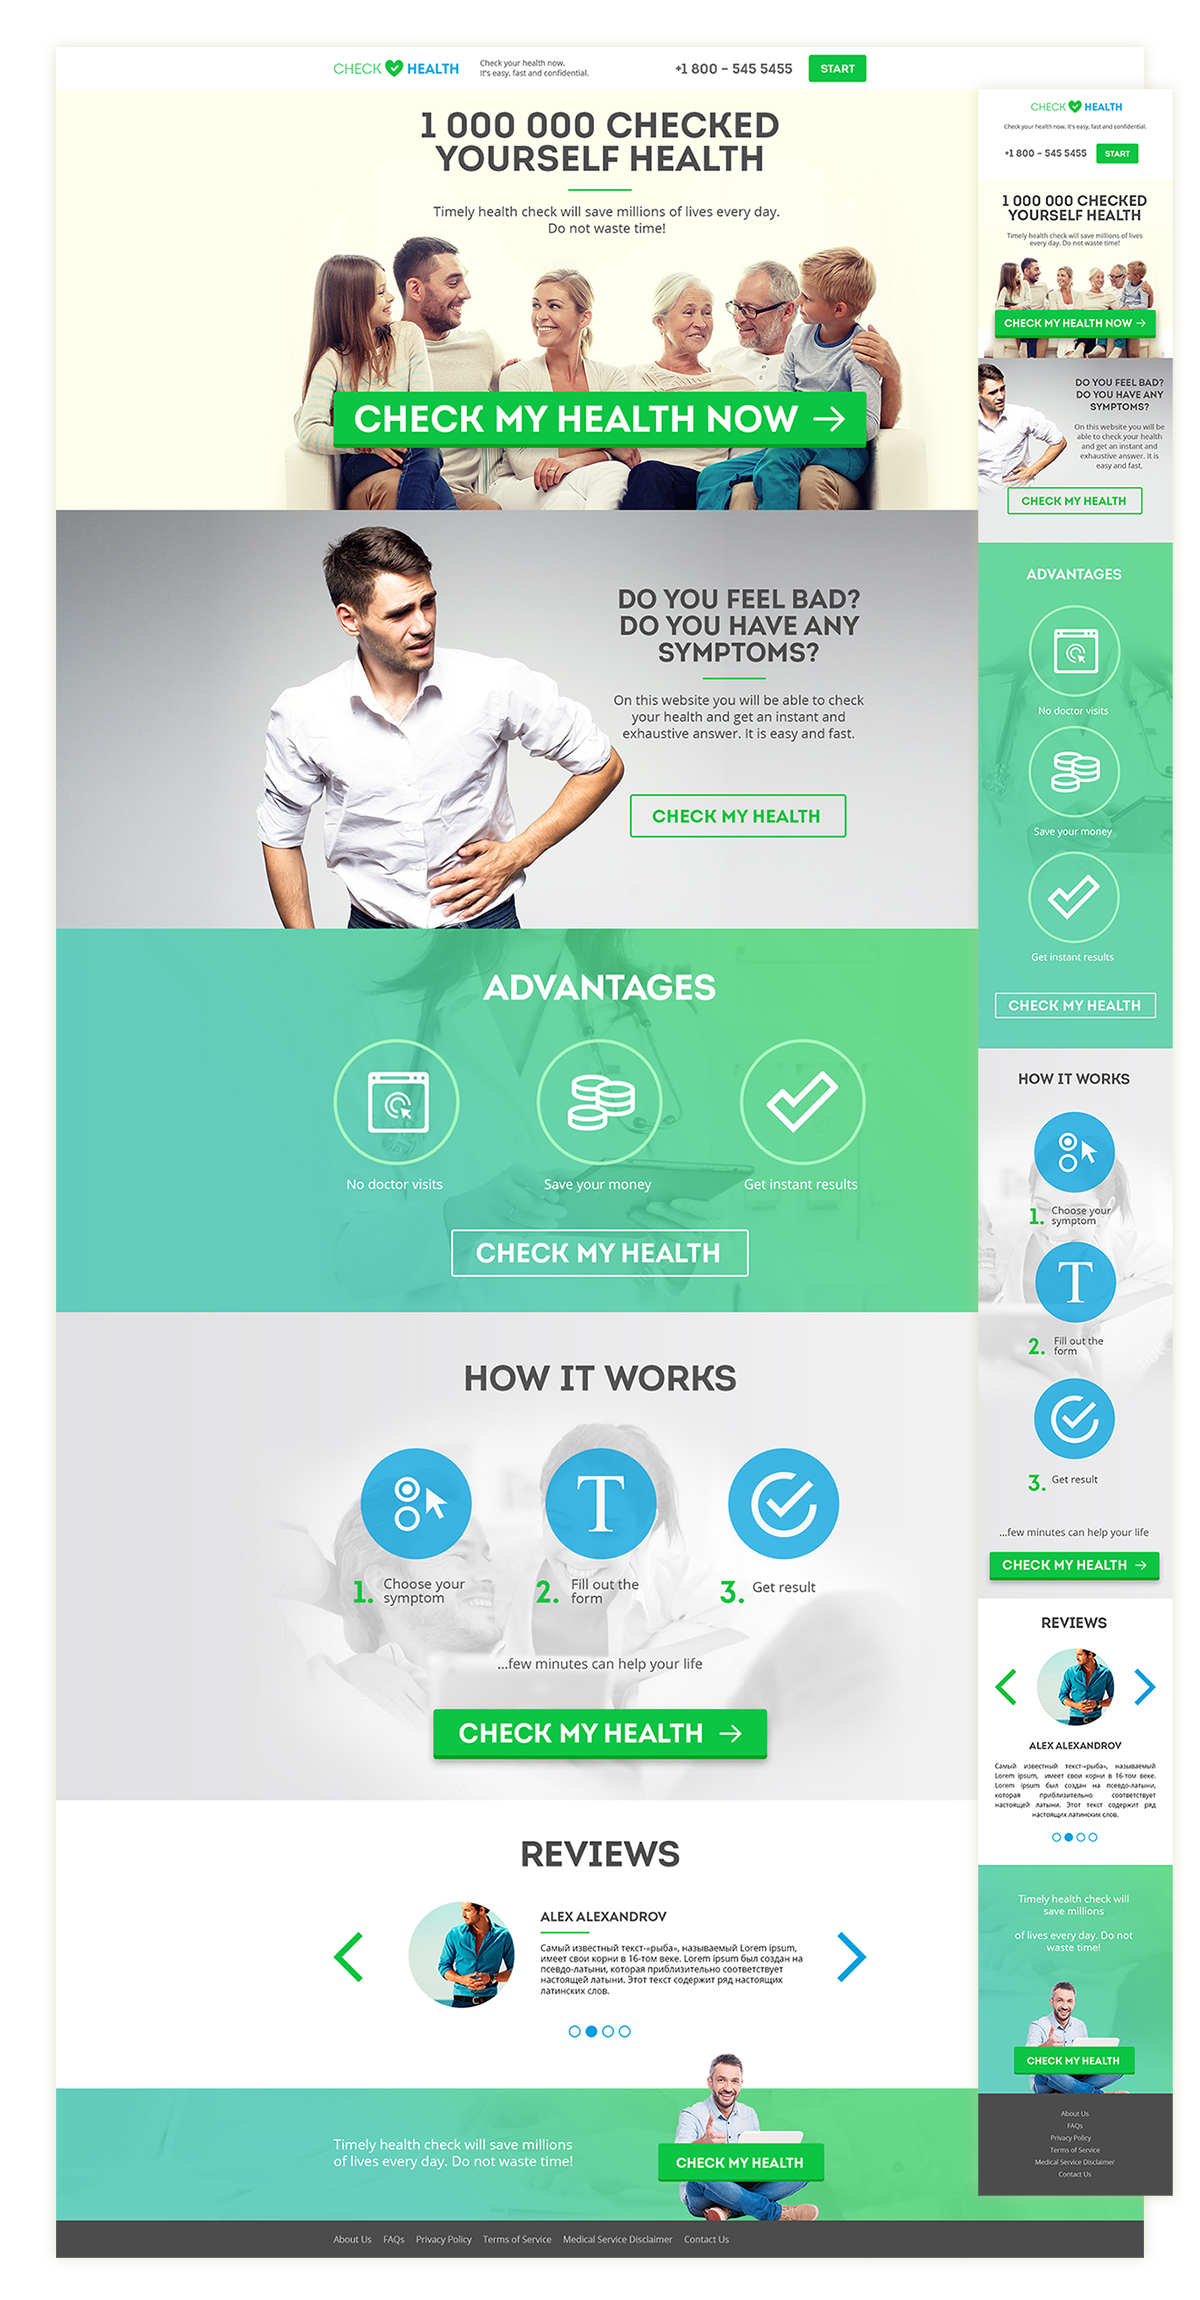 Checkhealth - проверка состояния здоровья онлайн / мобильная версия